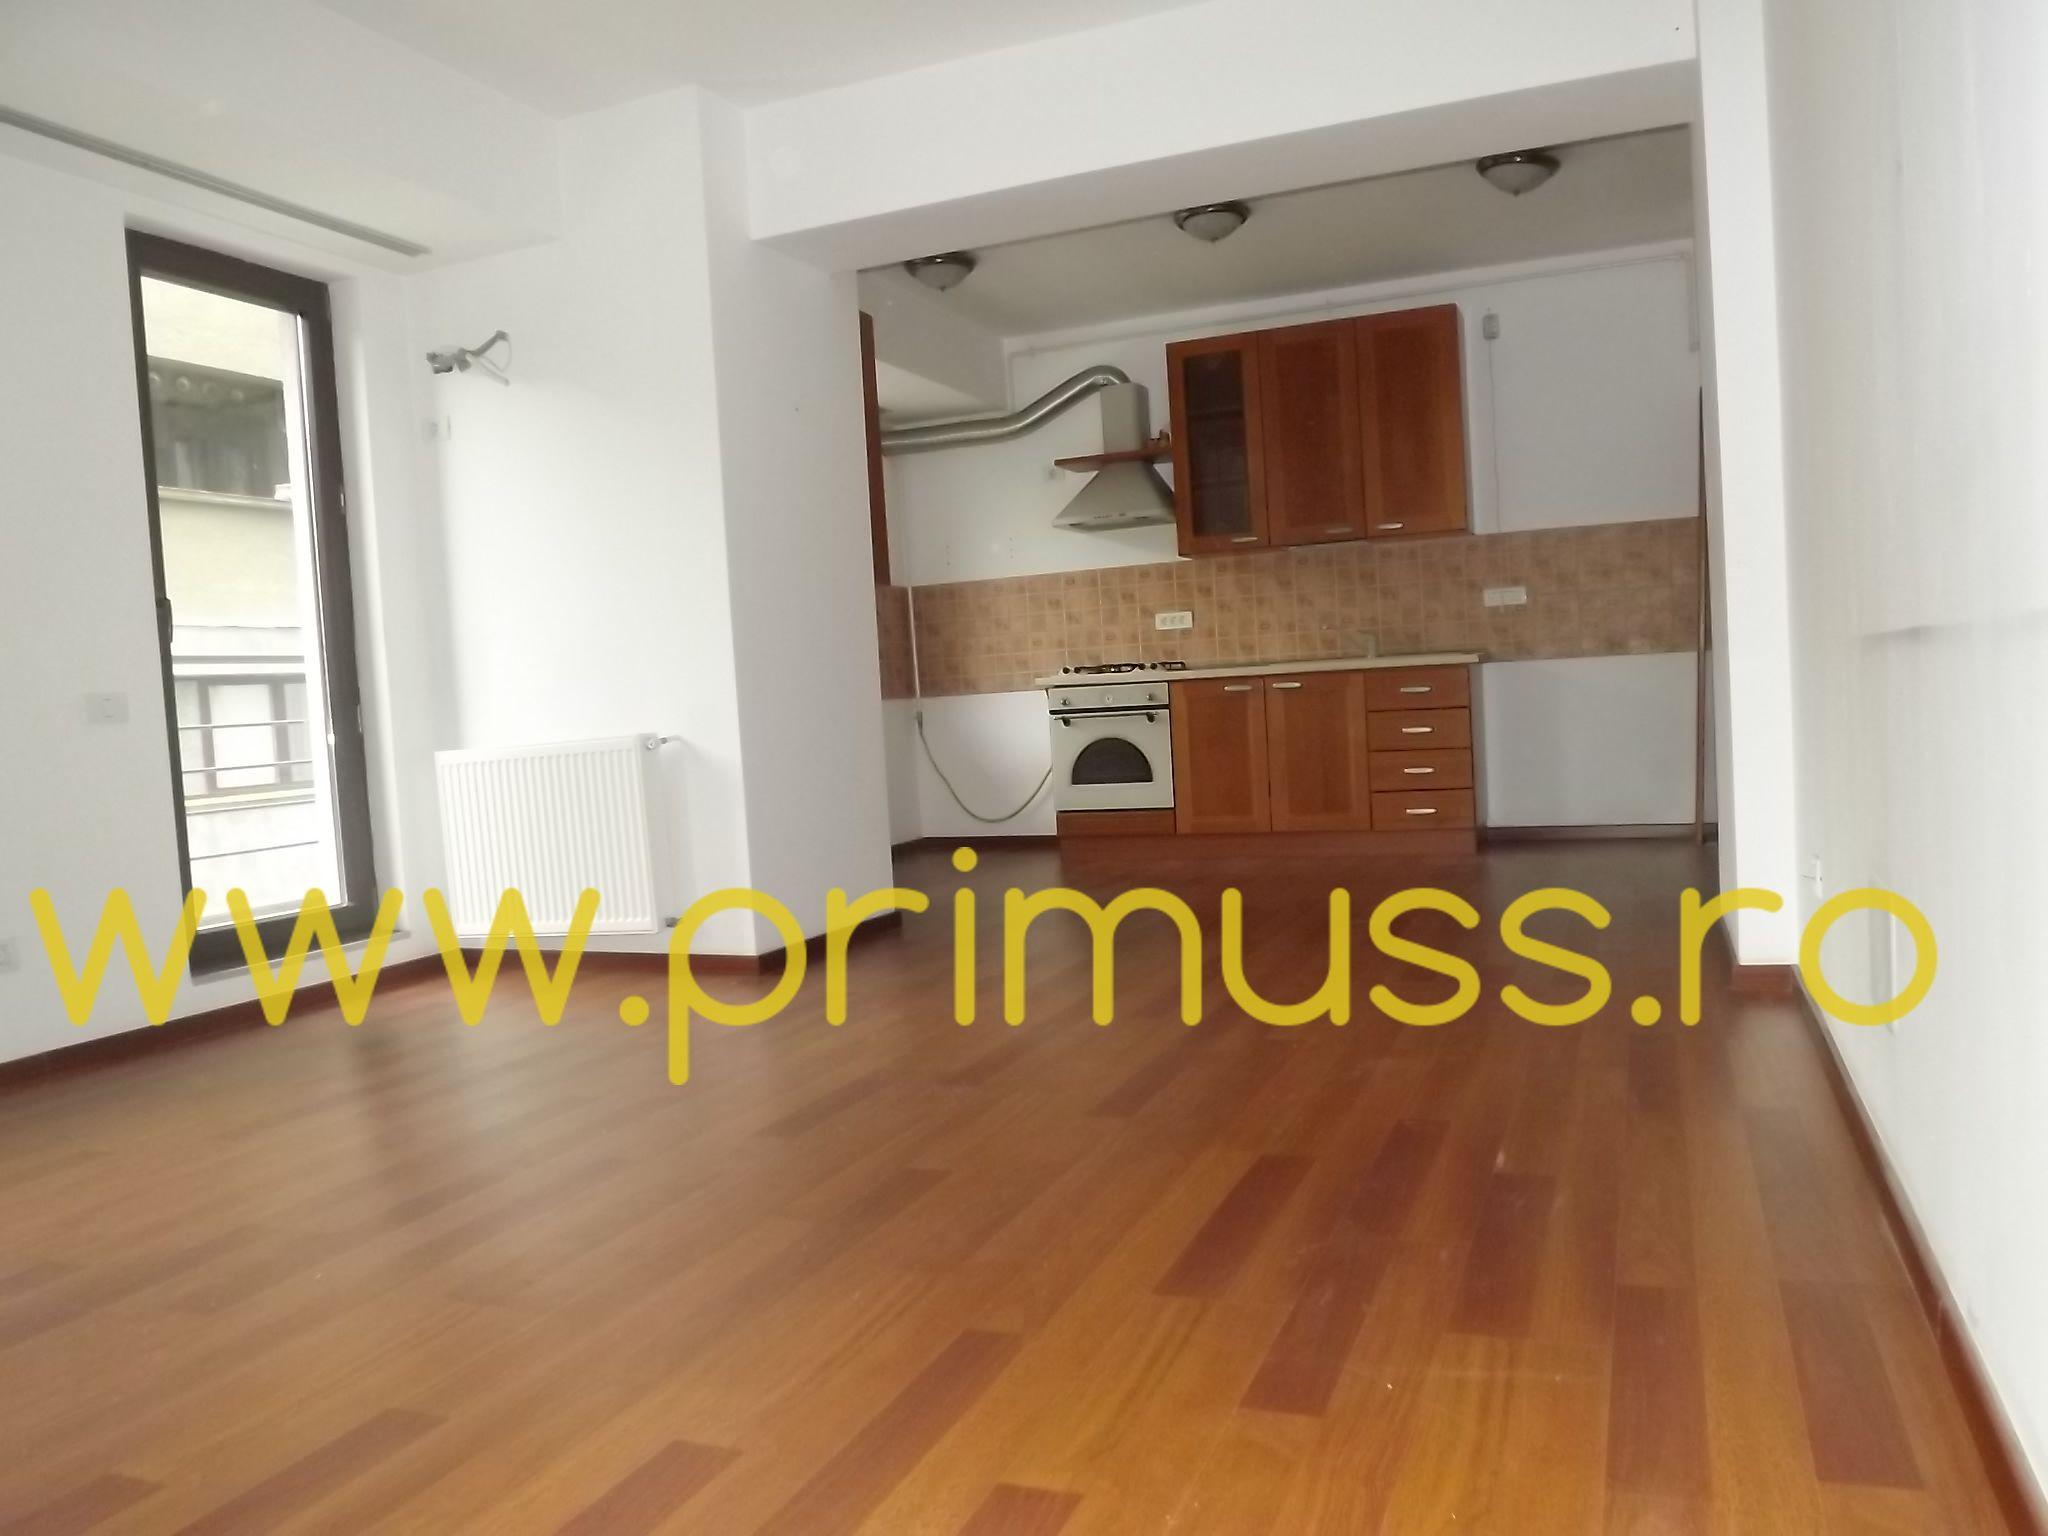 http://www.imobiliare-portal.ro/anunturi_imobiliare/27477/1/Unirii-Apartament.html Unirii - Natiunile Unite, apartament 2 camere, 54mp, constructie noua 2012